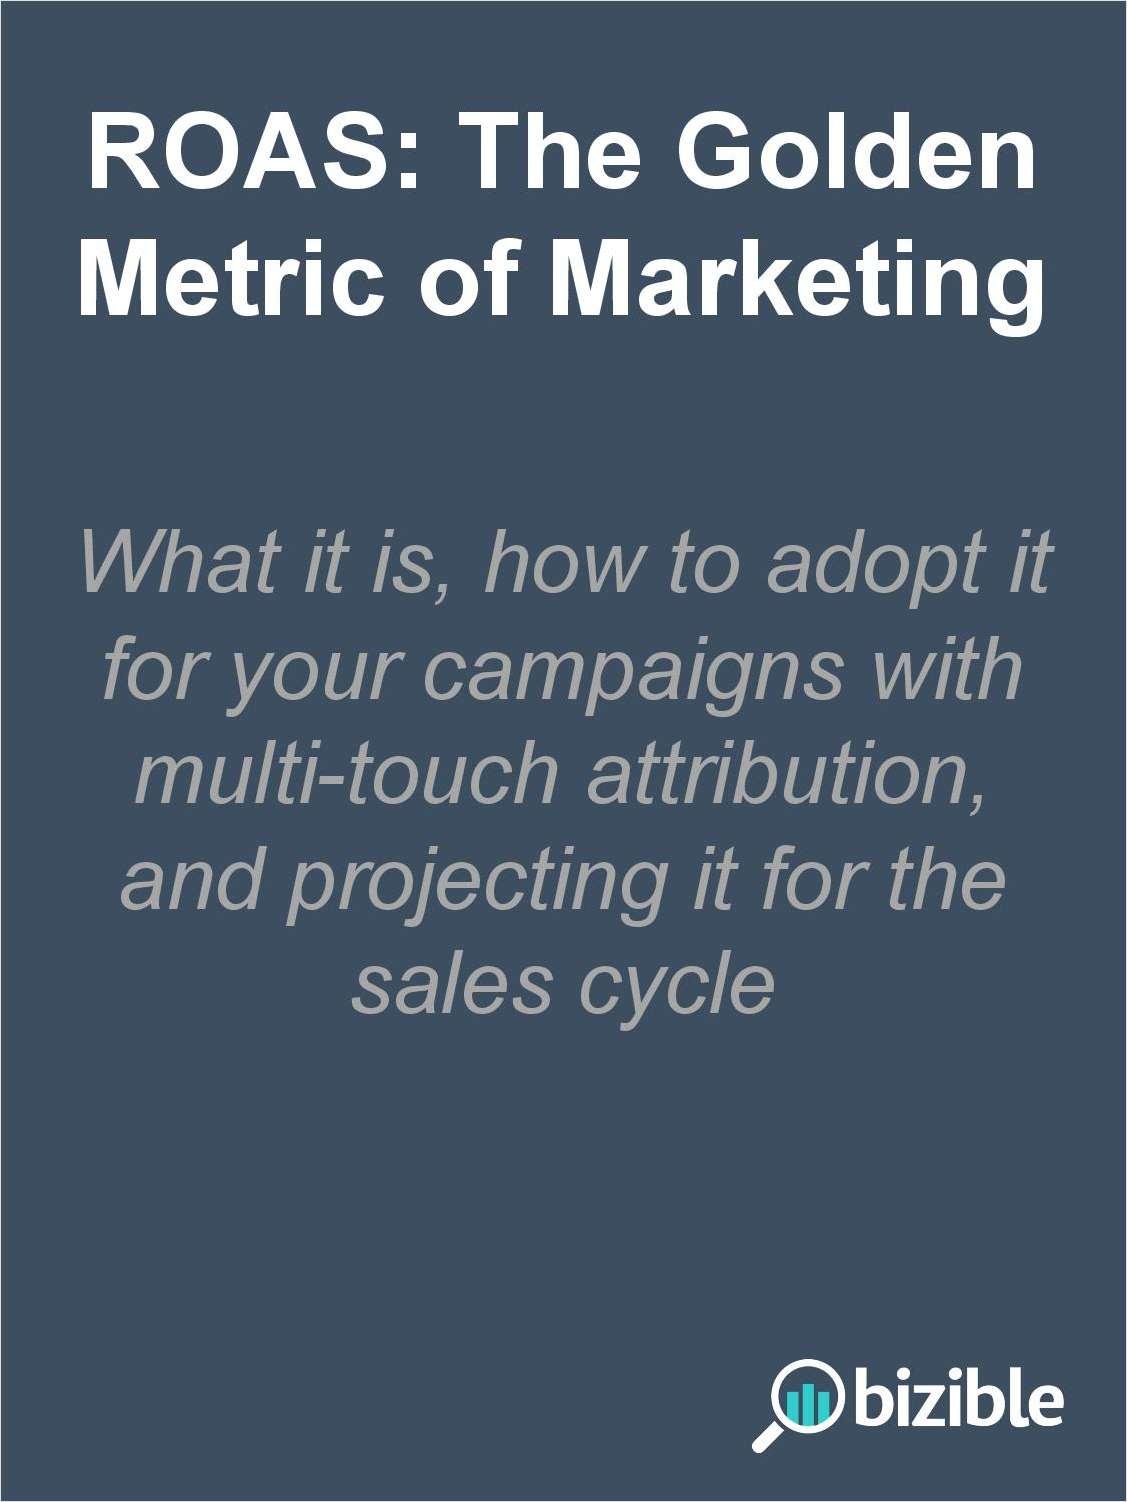 ROAS: The Golden Metric of Marketing